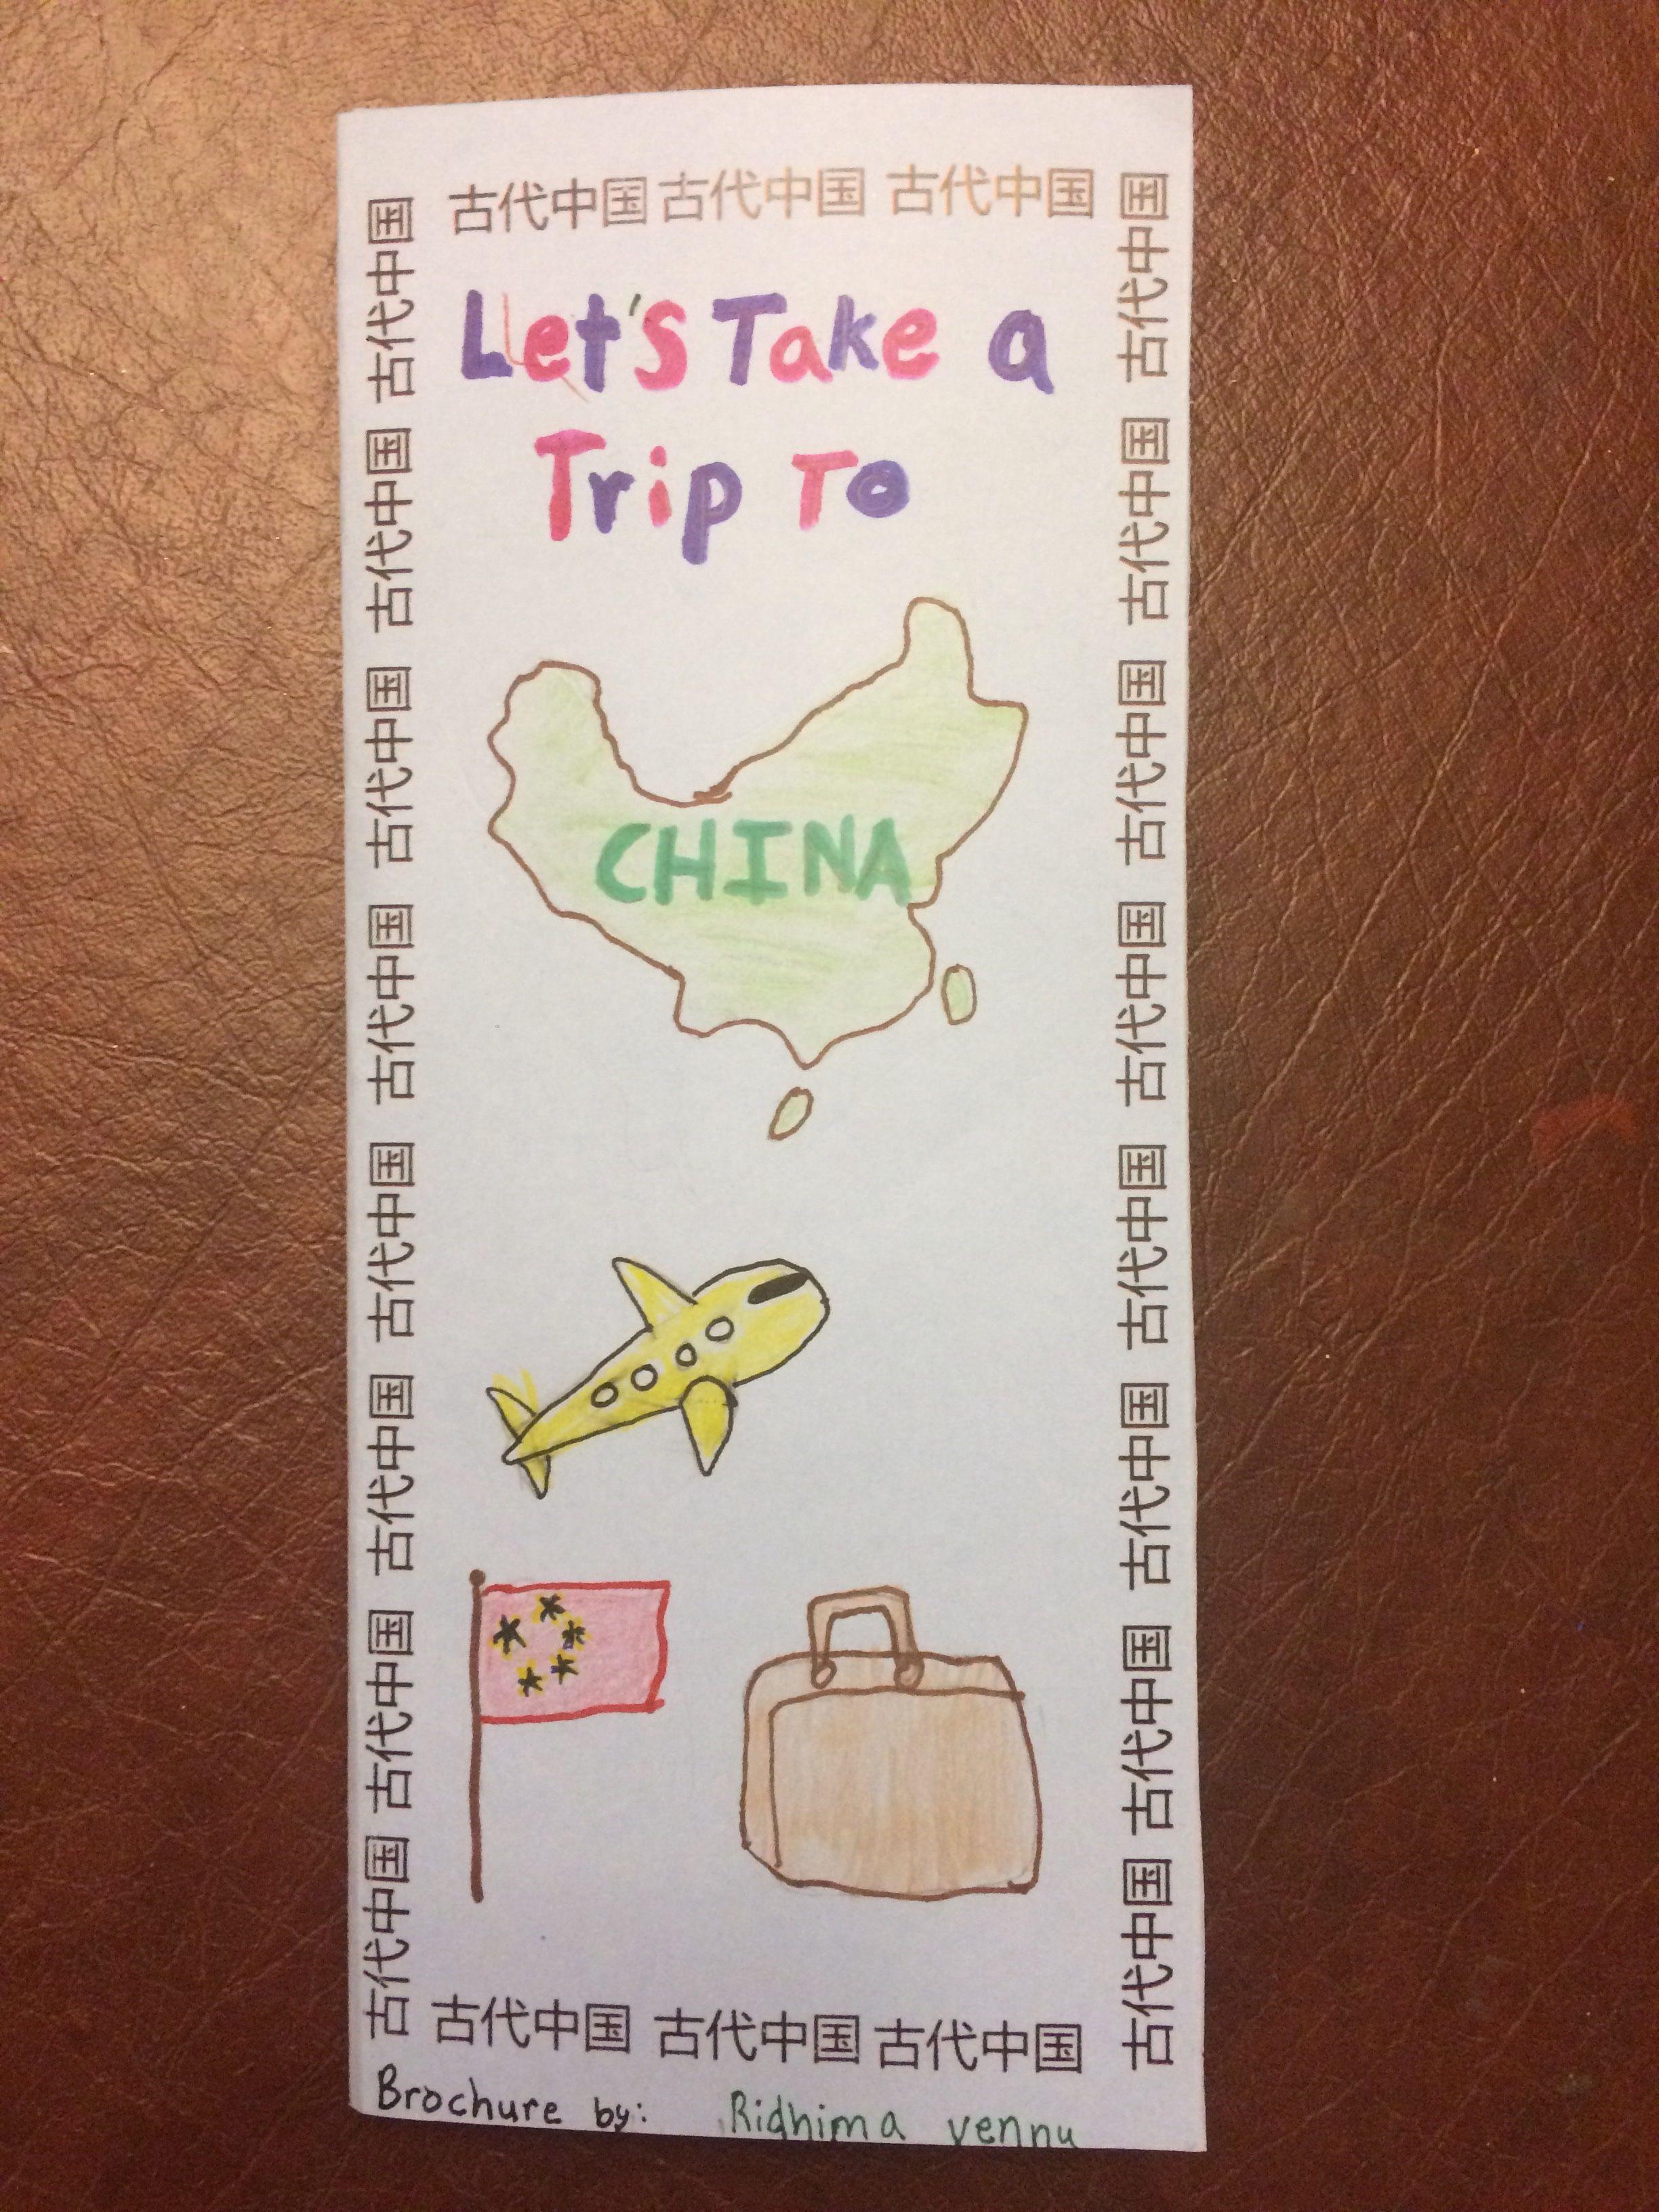 Ancient China Travel Brochure Elementary School Projects School Study Tips Kindergarten Teachers